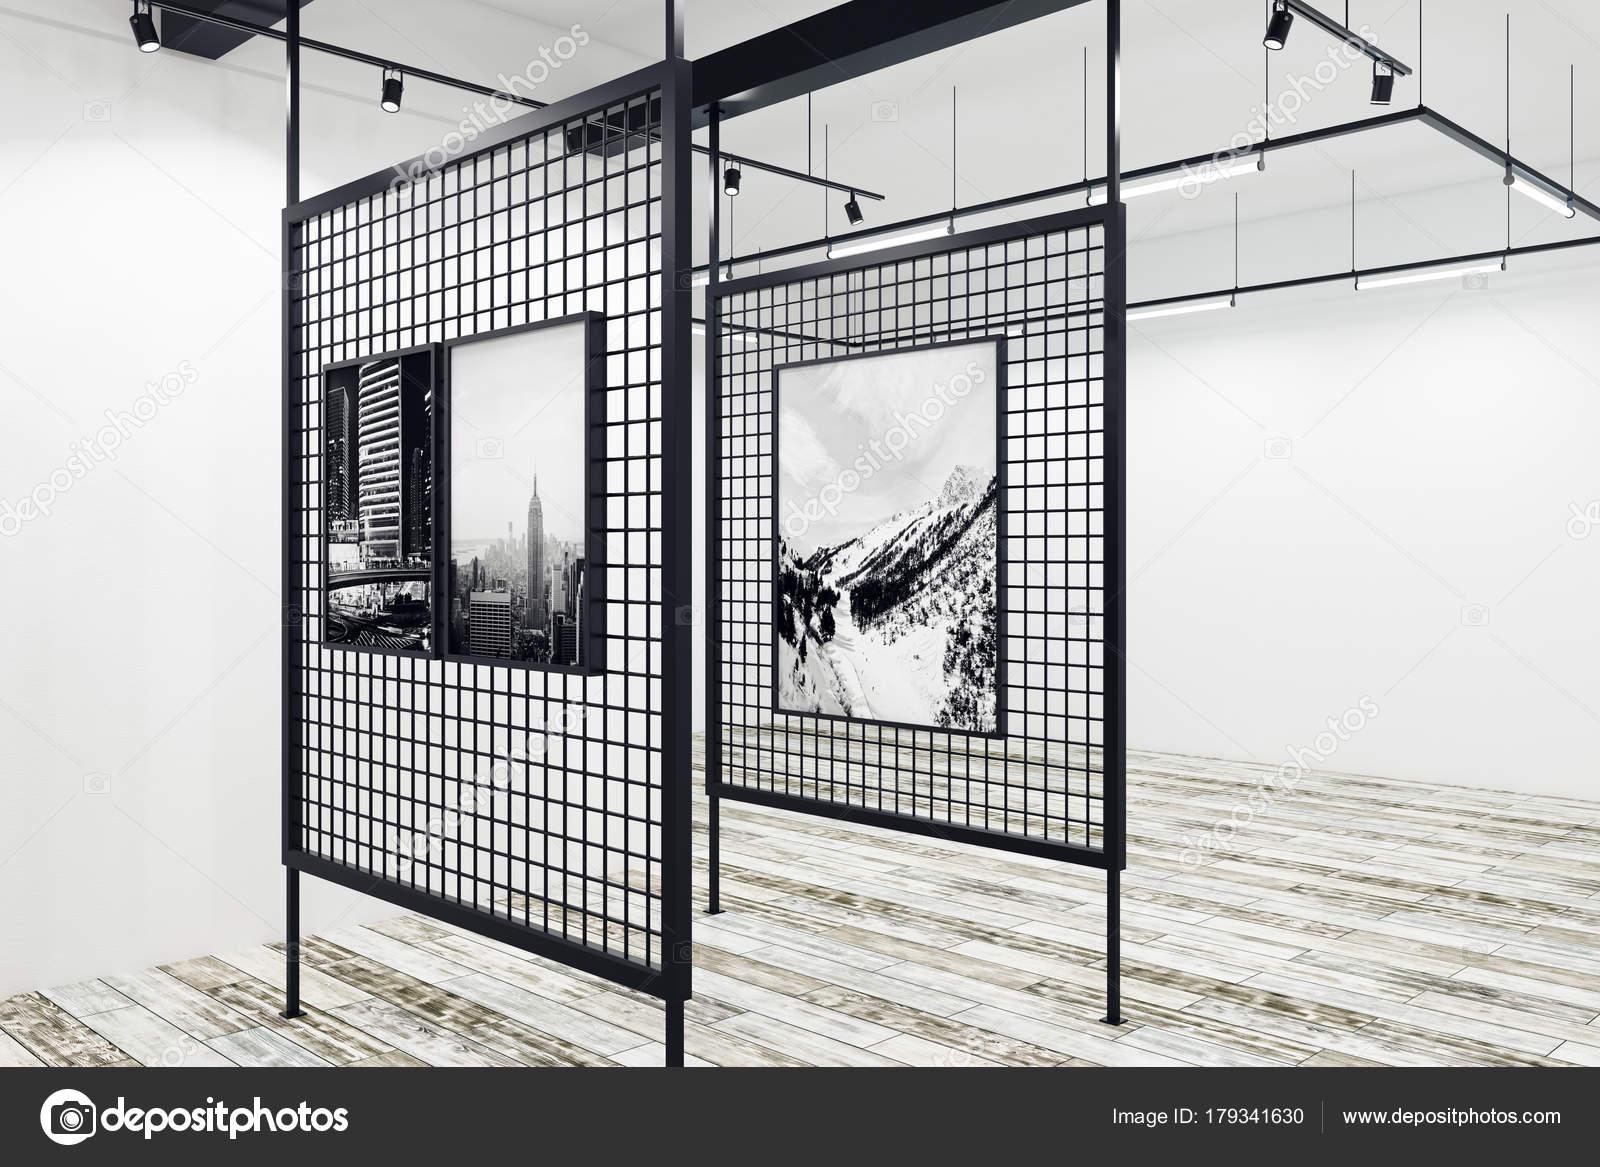 Zeitgenössische Galerie design — Stockfoto © peshkova #179341630